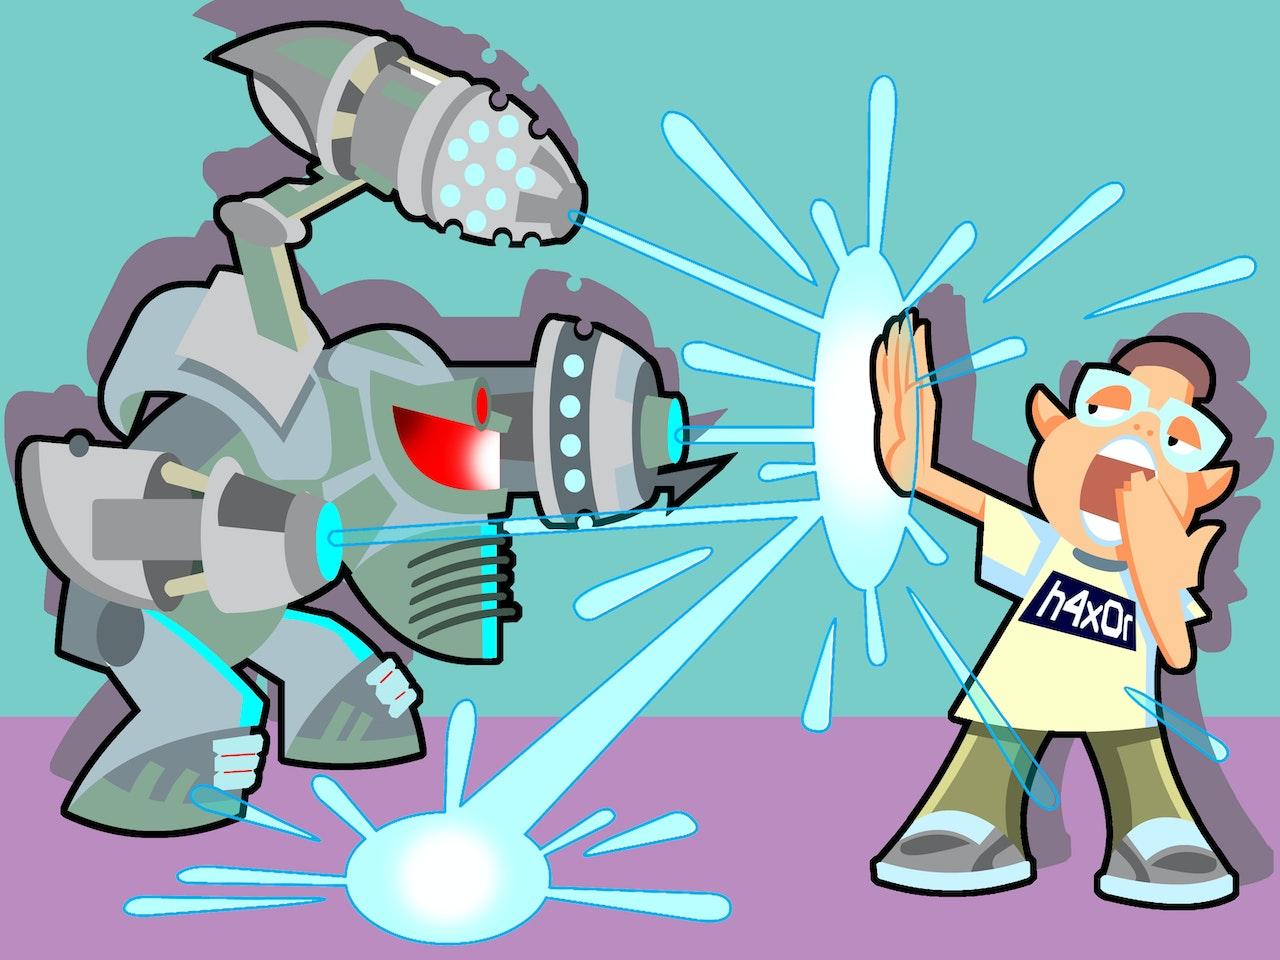 funny happy humorous comical colourful graphic cartoon anime battle weapon droid lazer gun nerd geek blast